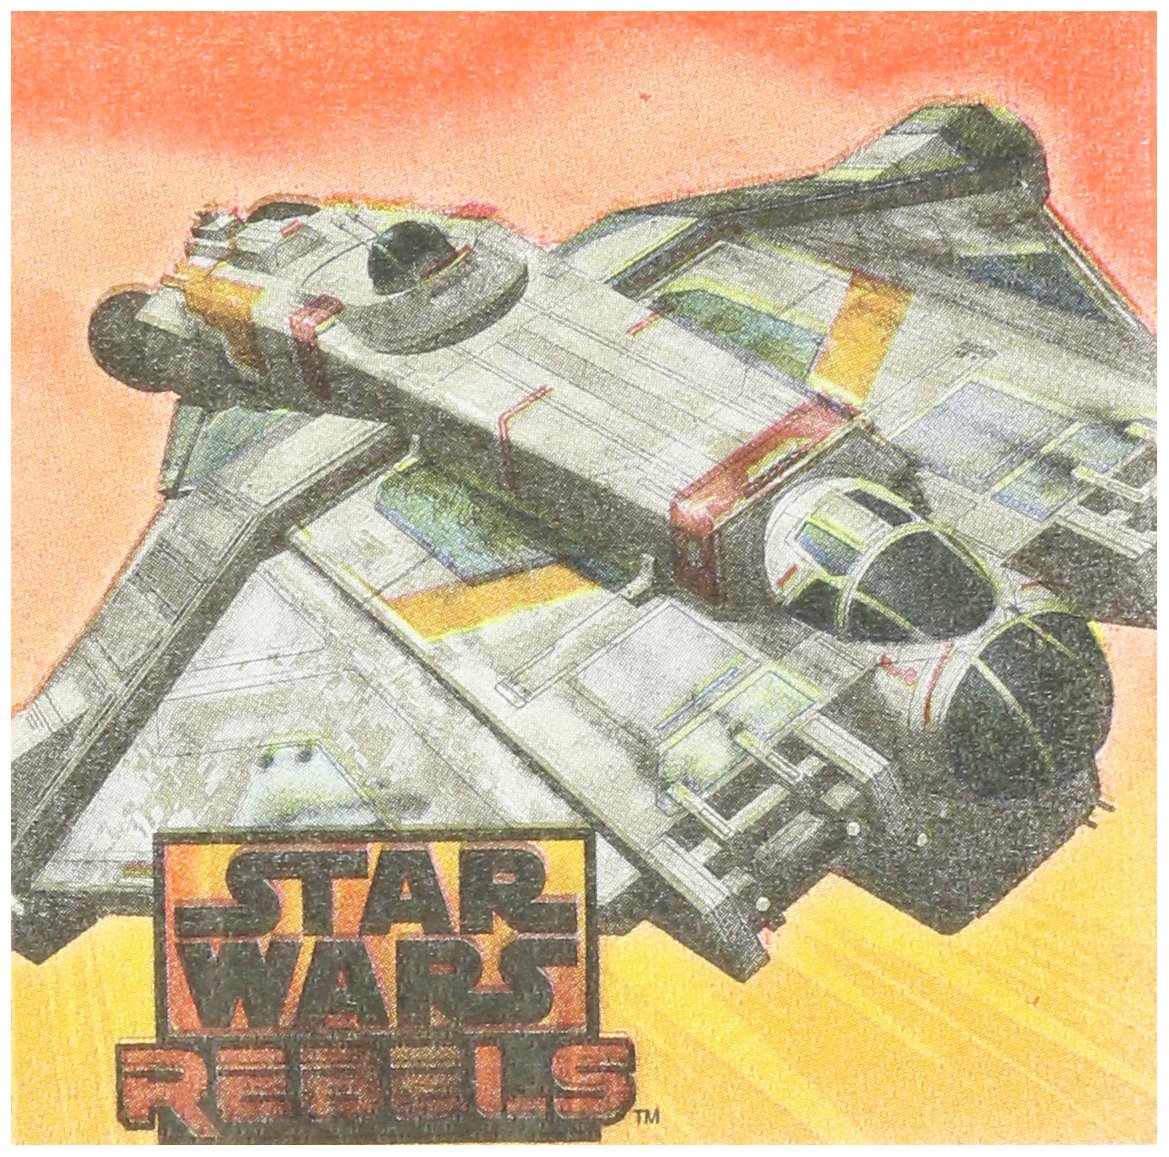 Star Wars Rebels Beverage Napkins (16) スターウォーズ反乱軍飲料ナプキン(16)ハロウィンクリスマス B00OD1S7U2